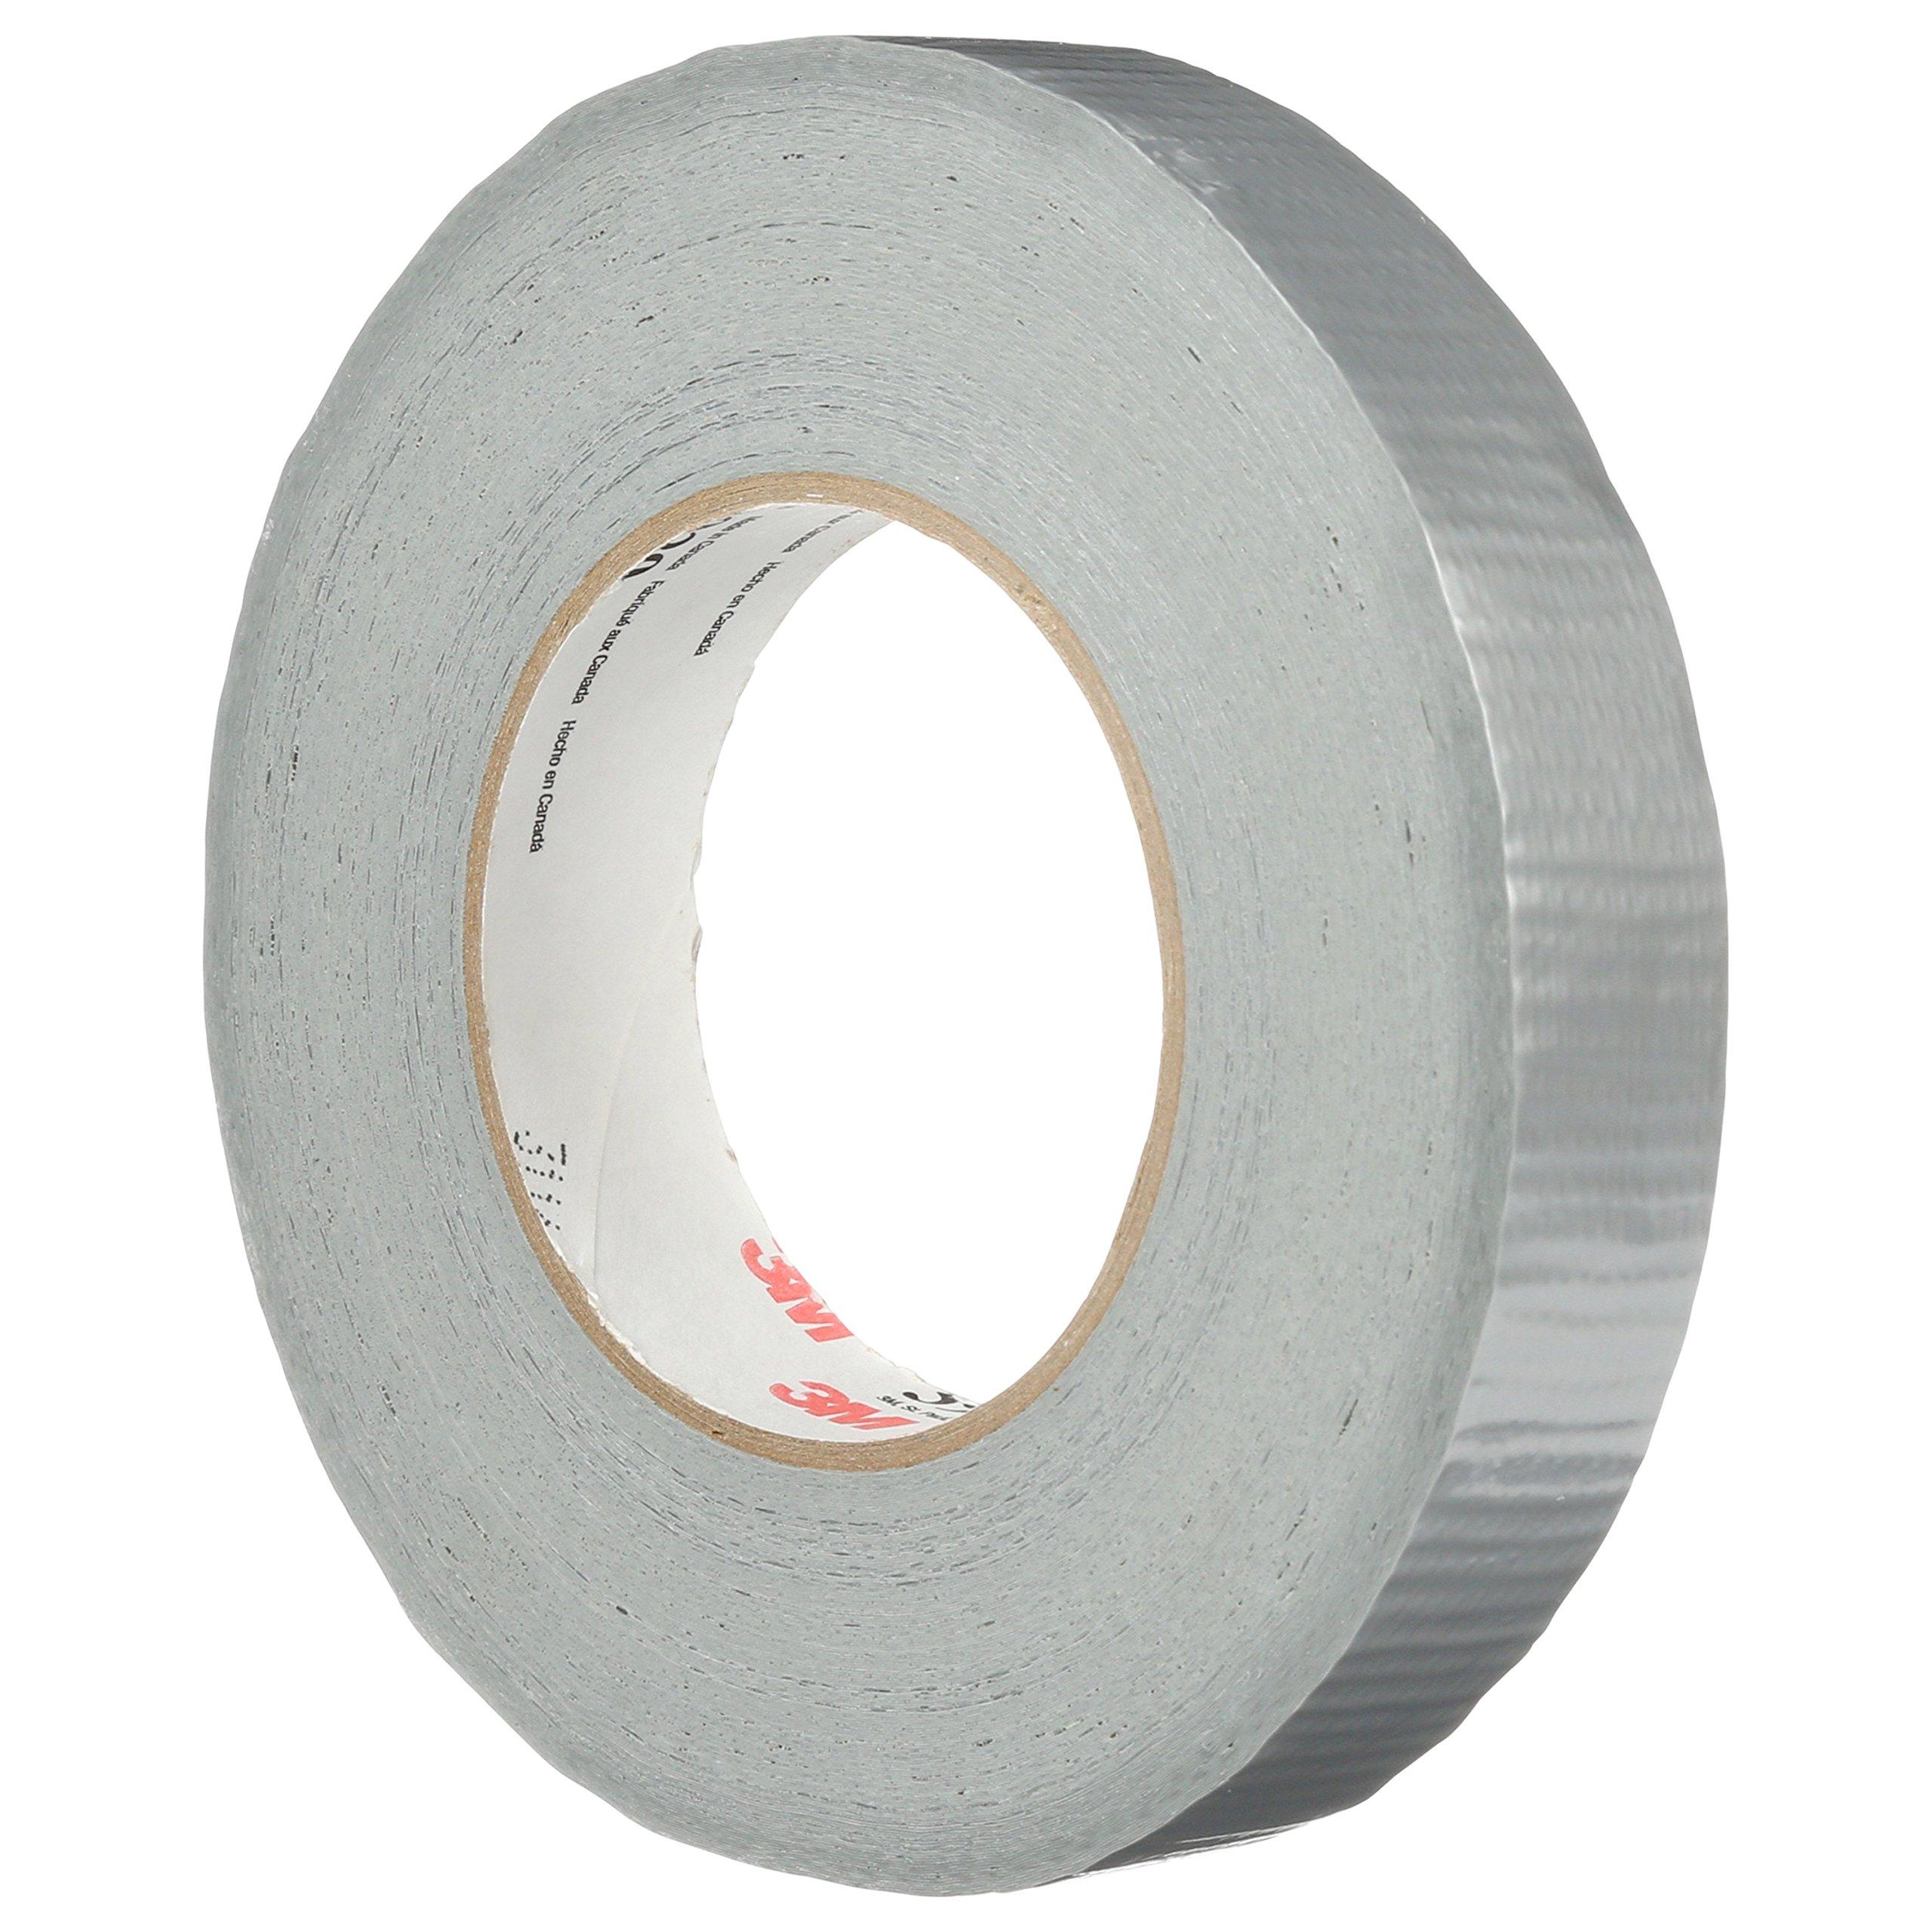 3M Heavy Duty Duct Tape 3939 Silver, 24 mm x 54.8 m 9.0 mil (Case of 36)